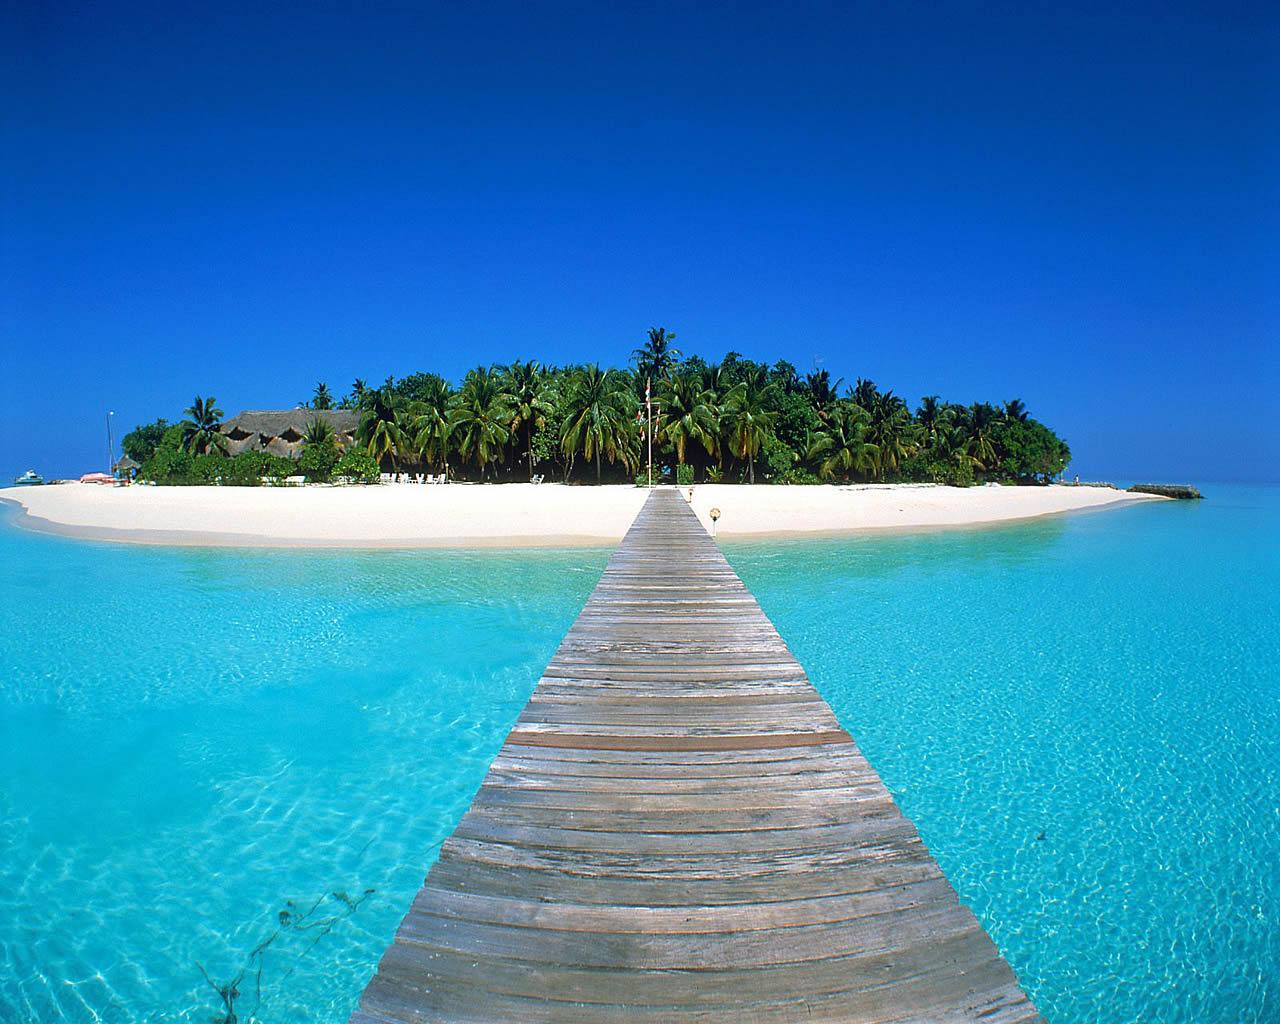 Tropical Island Wallpaper 10610 Hd Wallpapers in Beach   Imagescicom 1280x1024